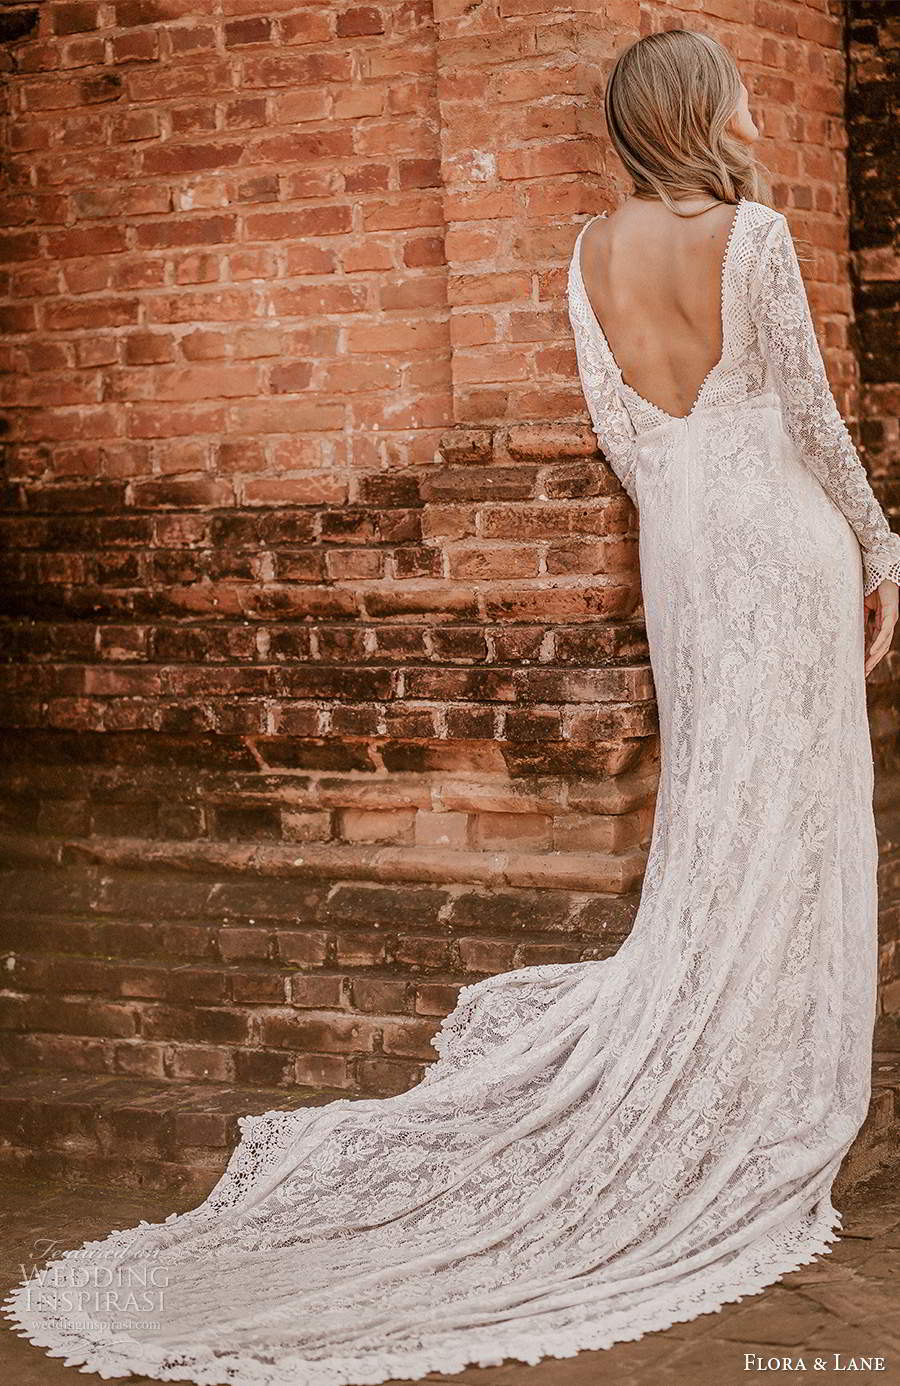 flora and lane 2019 bridal flutter sleeves scoop neckline fully embellished lace sheath romantic boho wedding dress scoop back chapel train (4) bv